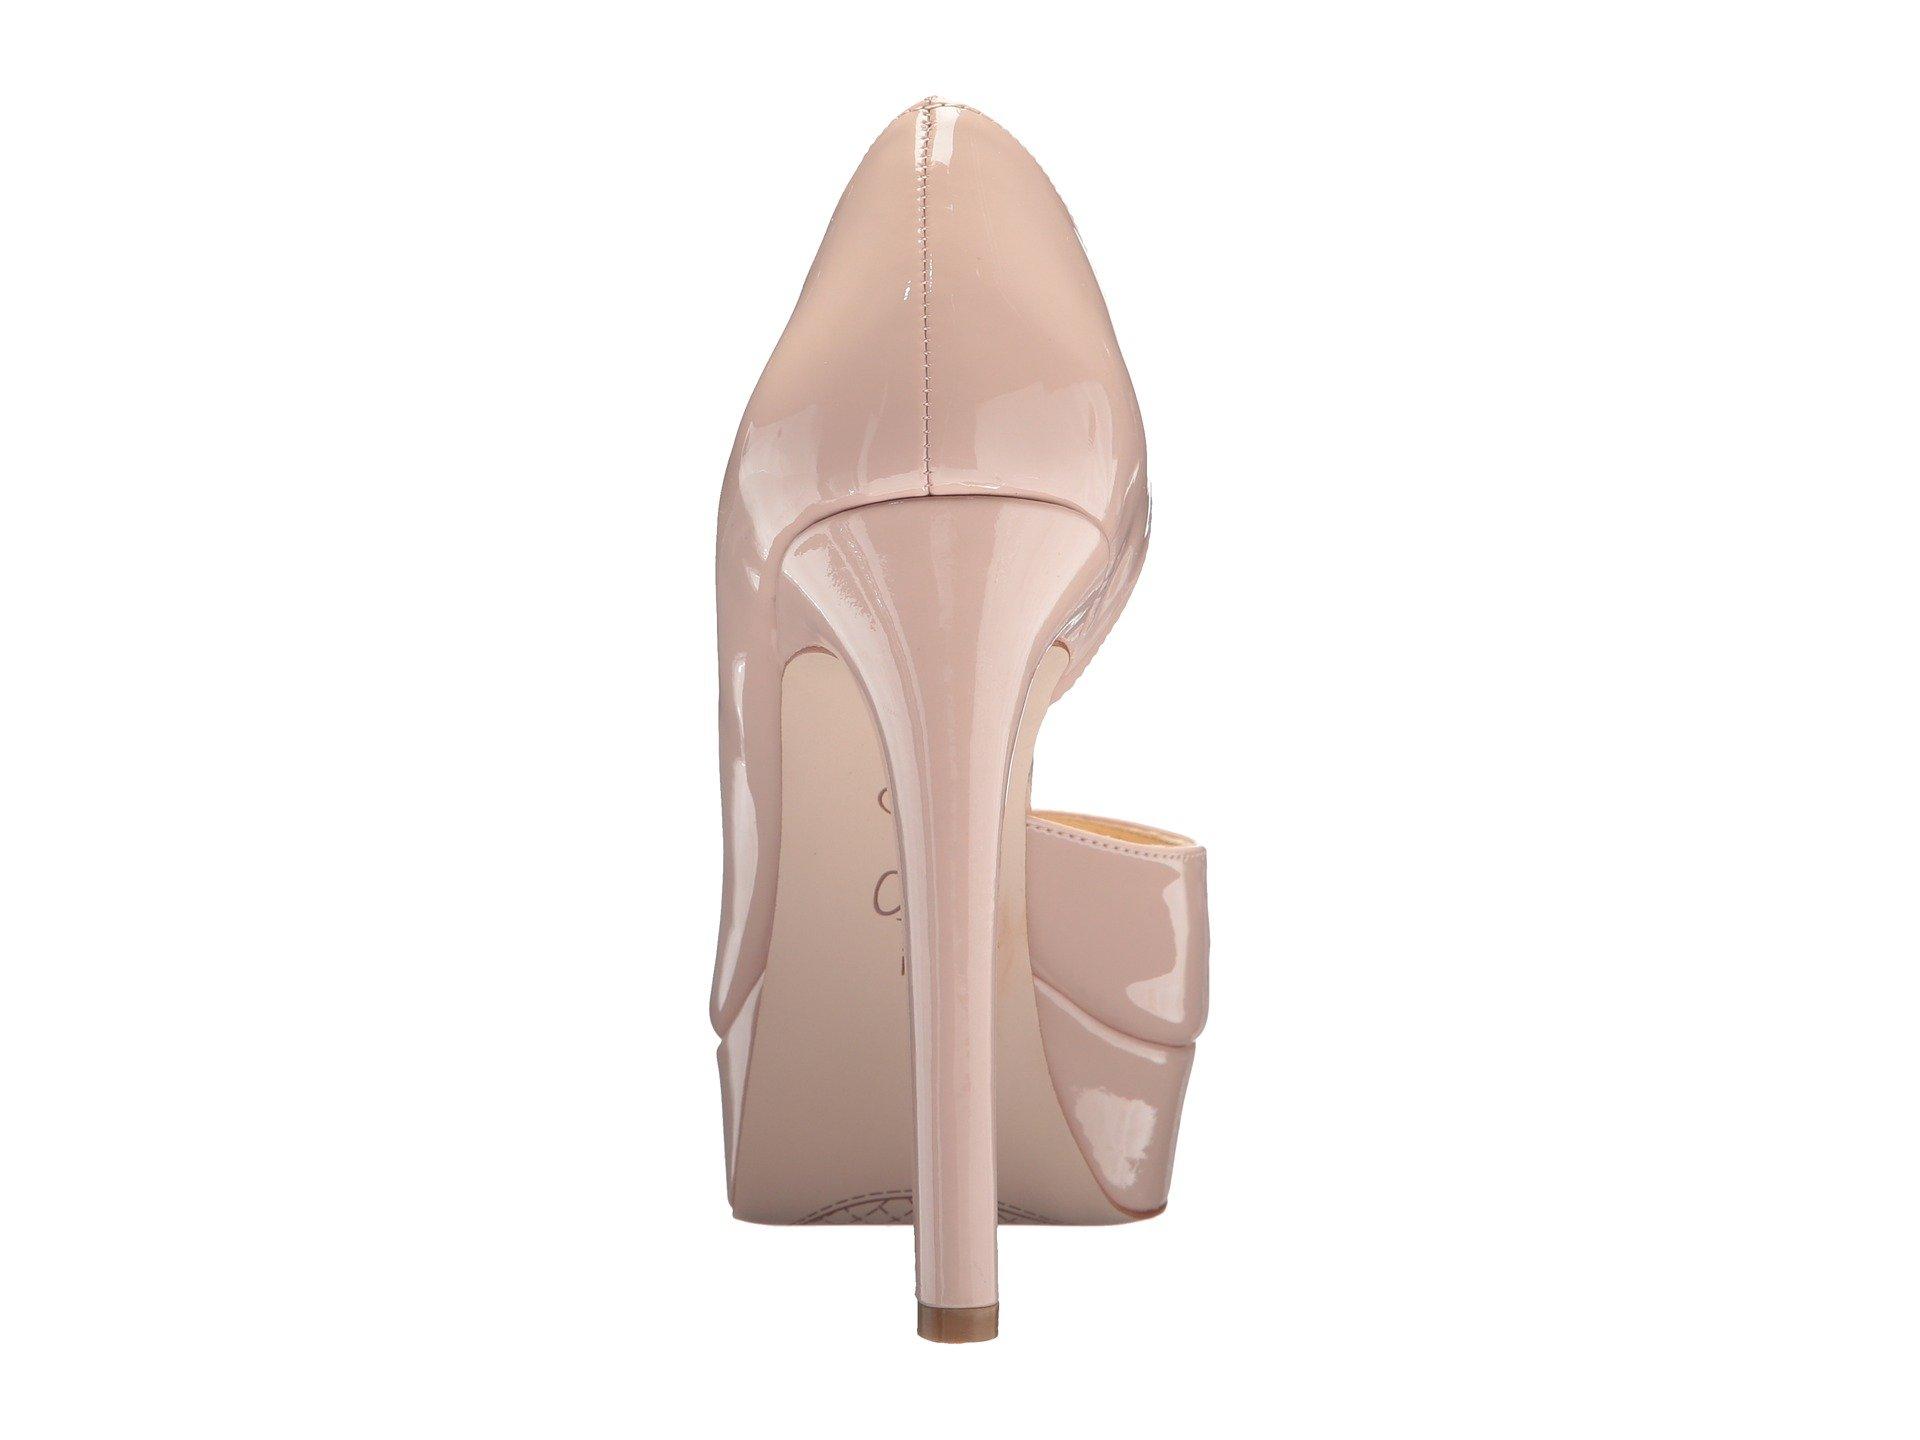 Jessica-Simpson-Martella-d-039-Orsay-Peep-Toe-Platform-Pumps thumbnail 13